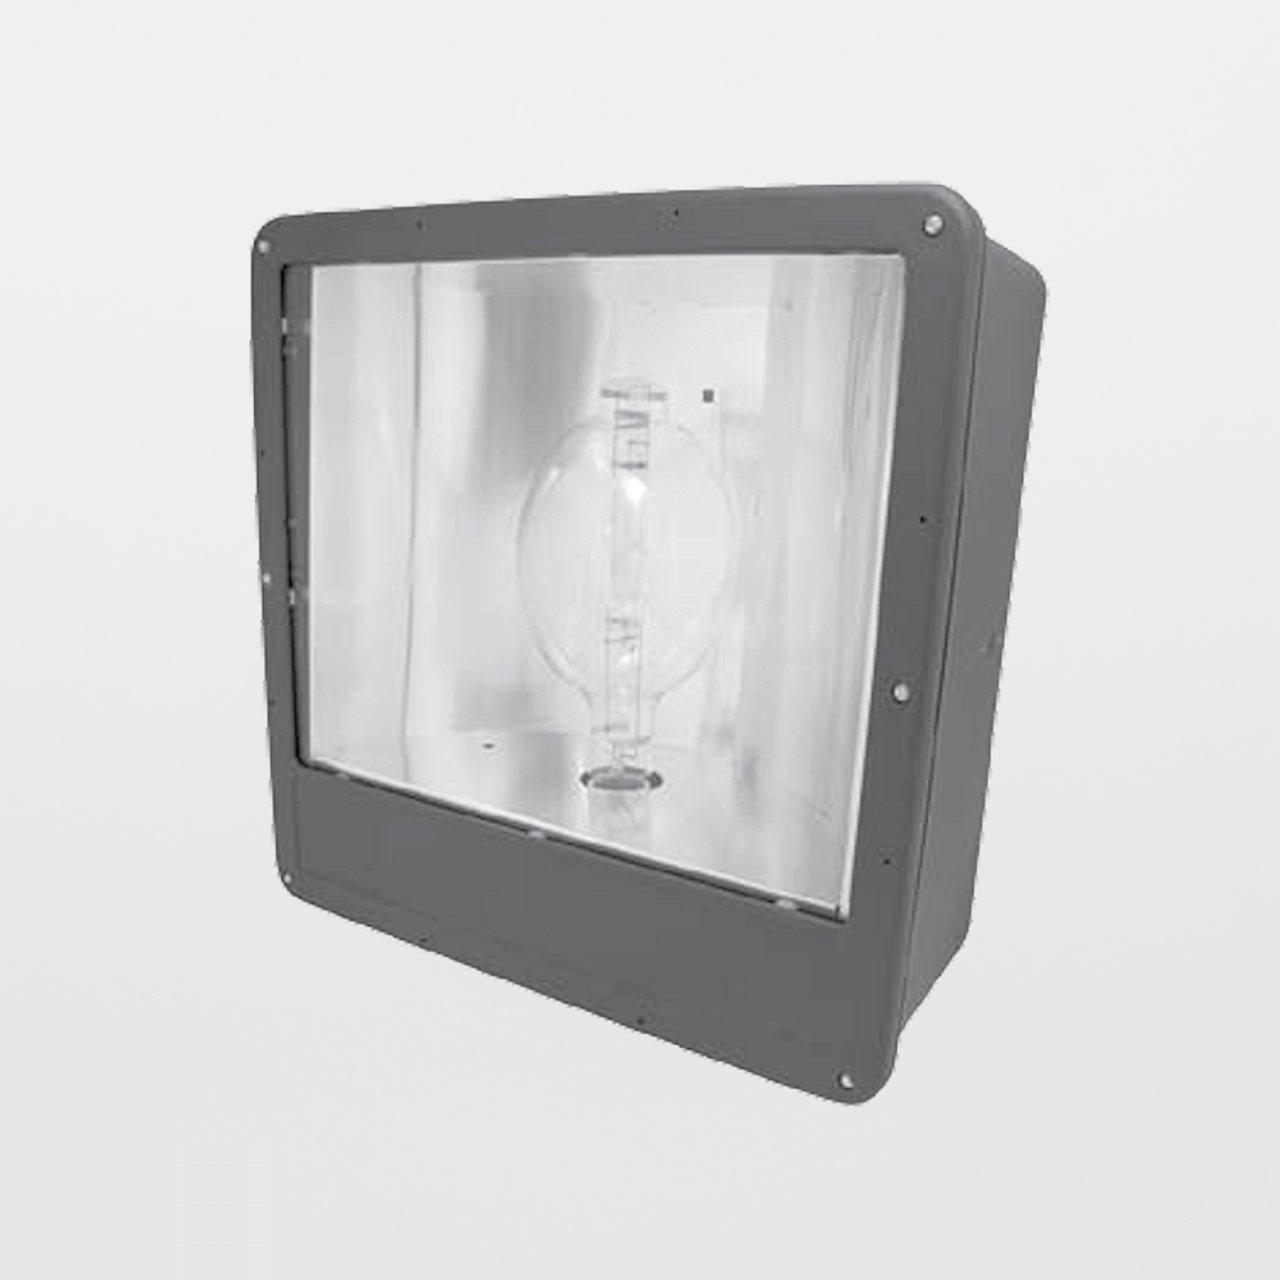 Maxlite MLPKG40LED50 LED Parking Garage Canopy Luminaires 37W